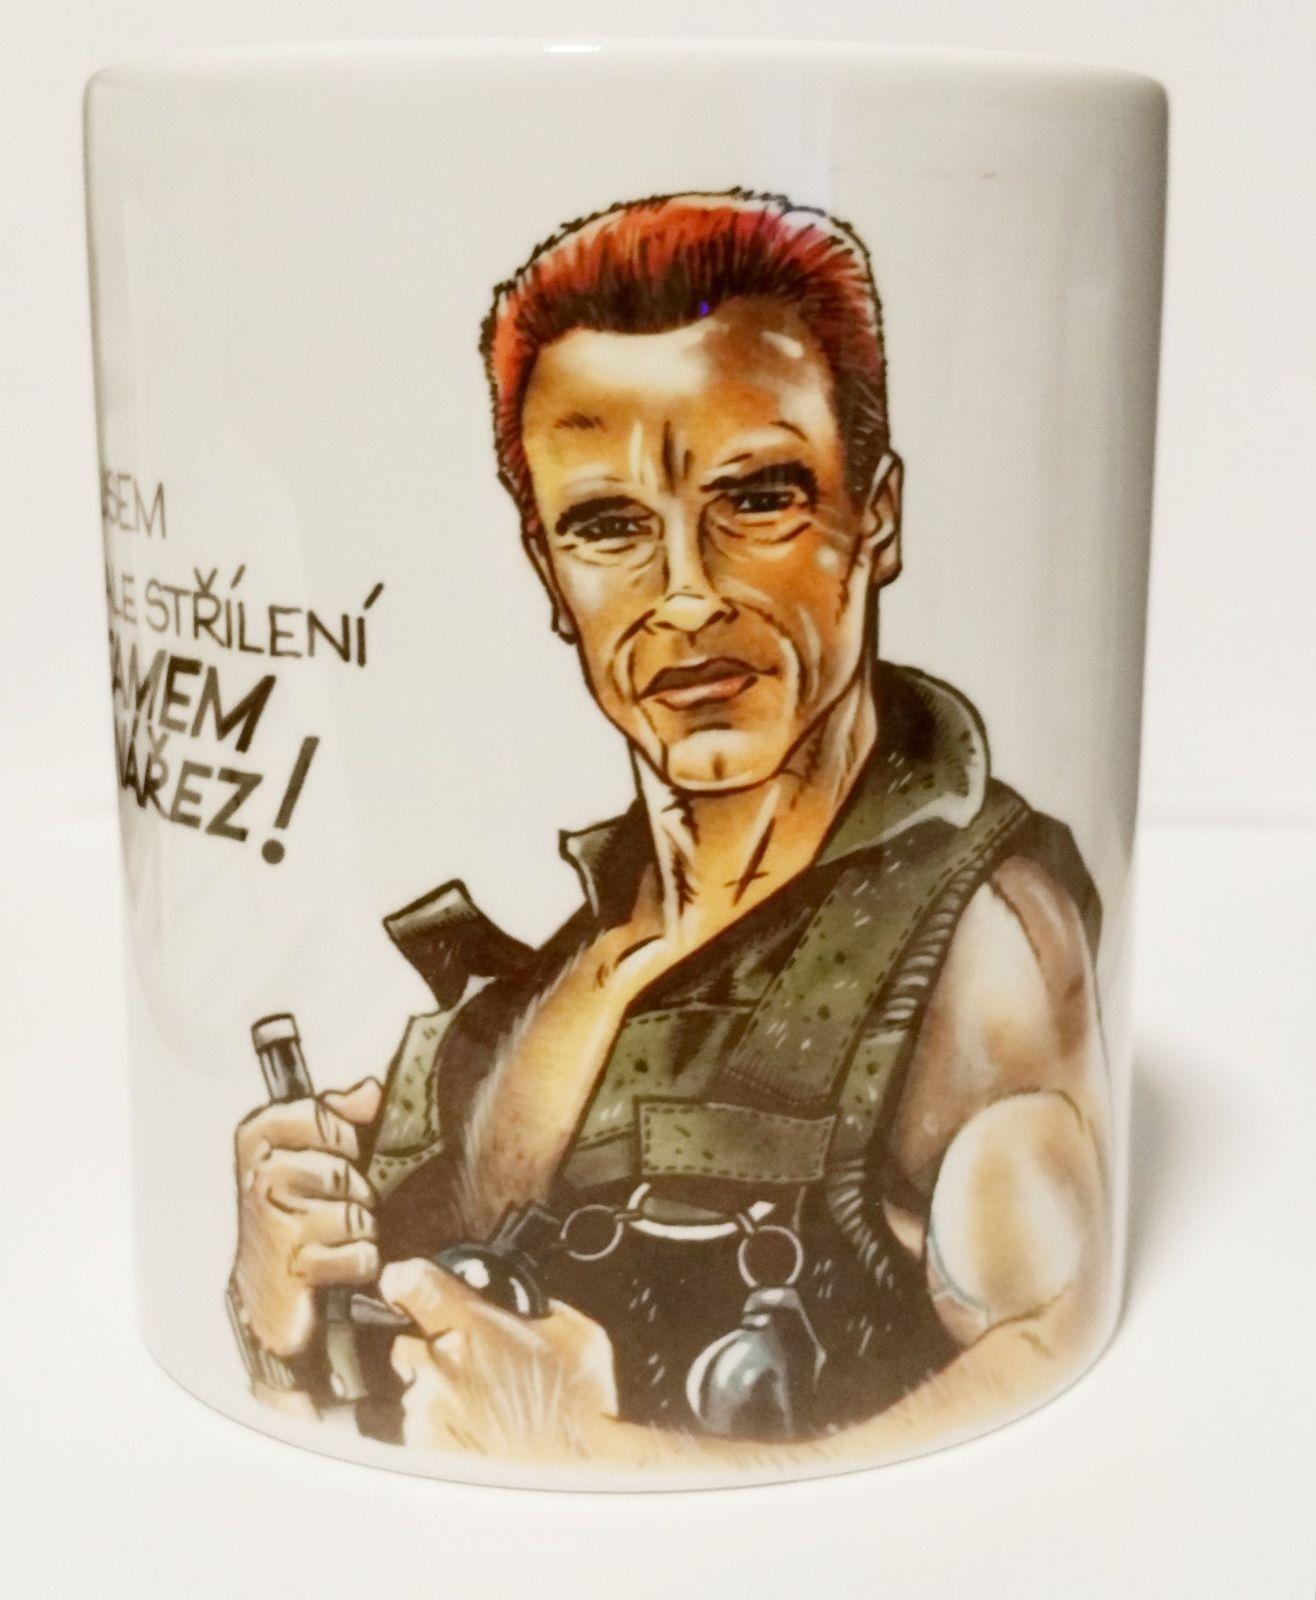 hrnek s potiskem Arnie